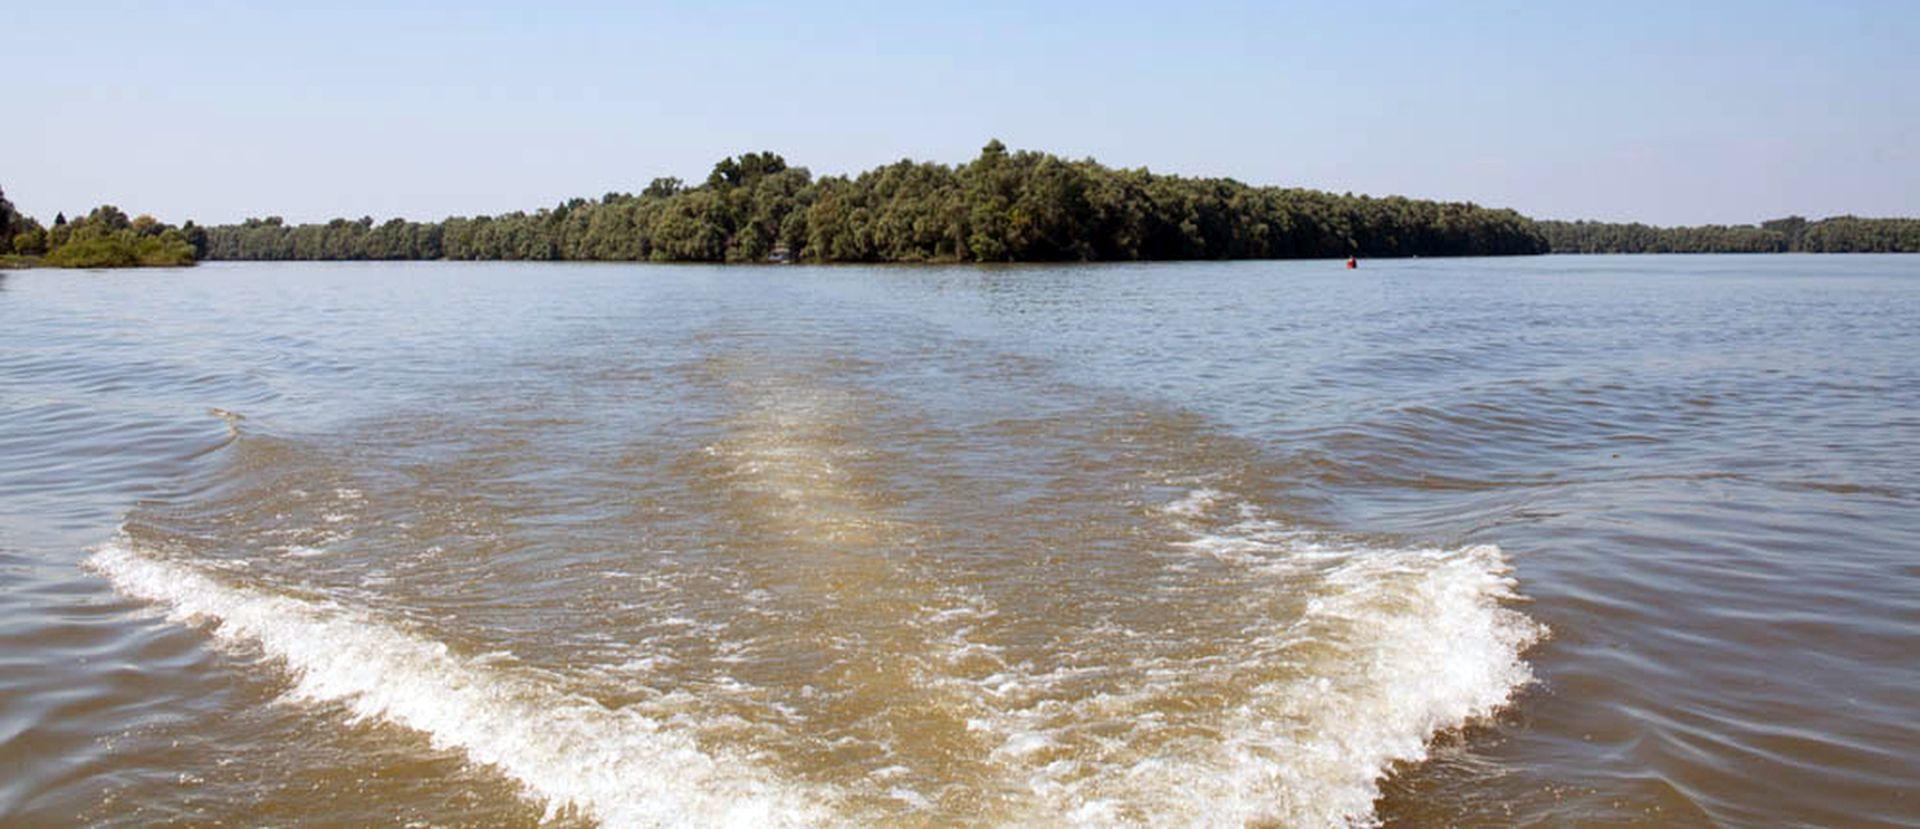 Zbog niskog vodostaja i leda obustavljena plovidba Dunavom